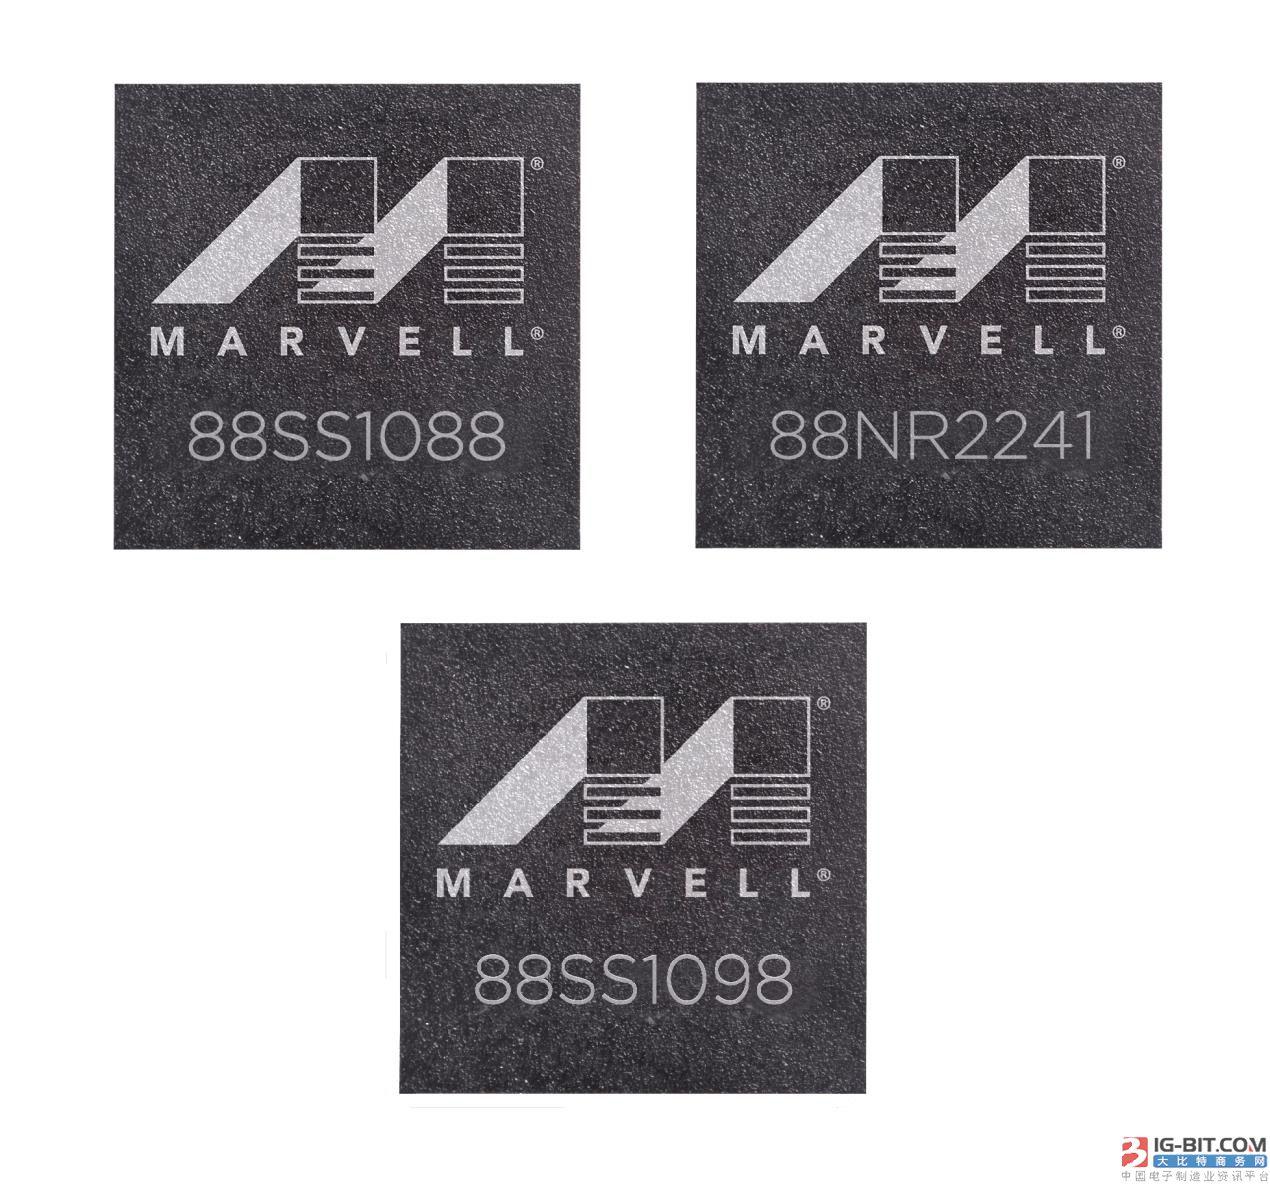 Marvell推出业界首个NVMe芯片组解决方案以满足新兴数据中心的SSD需求